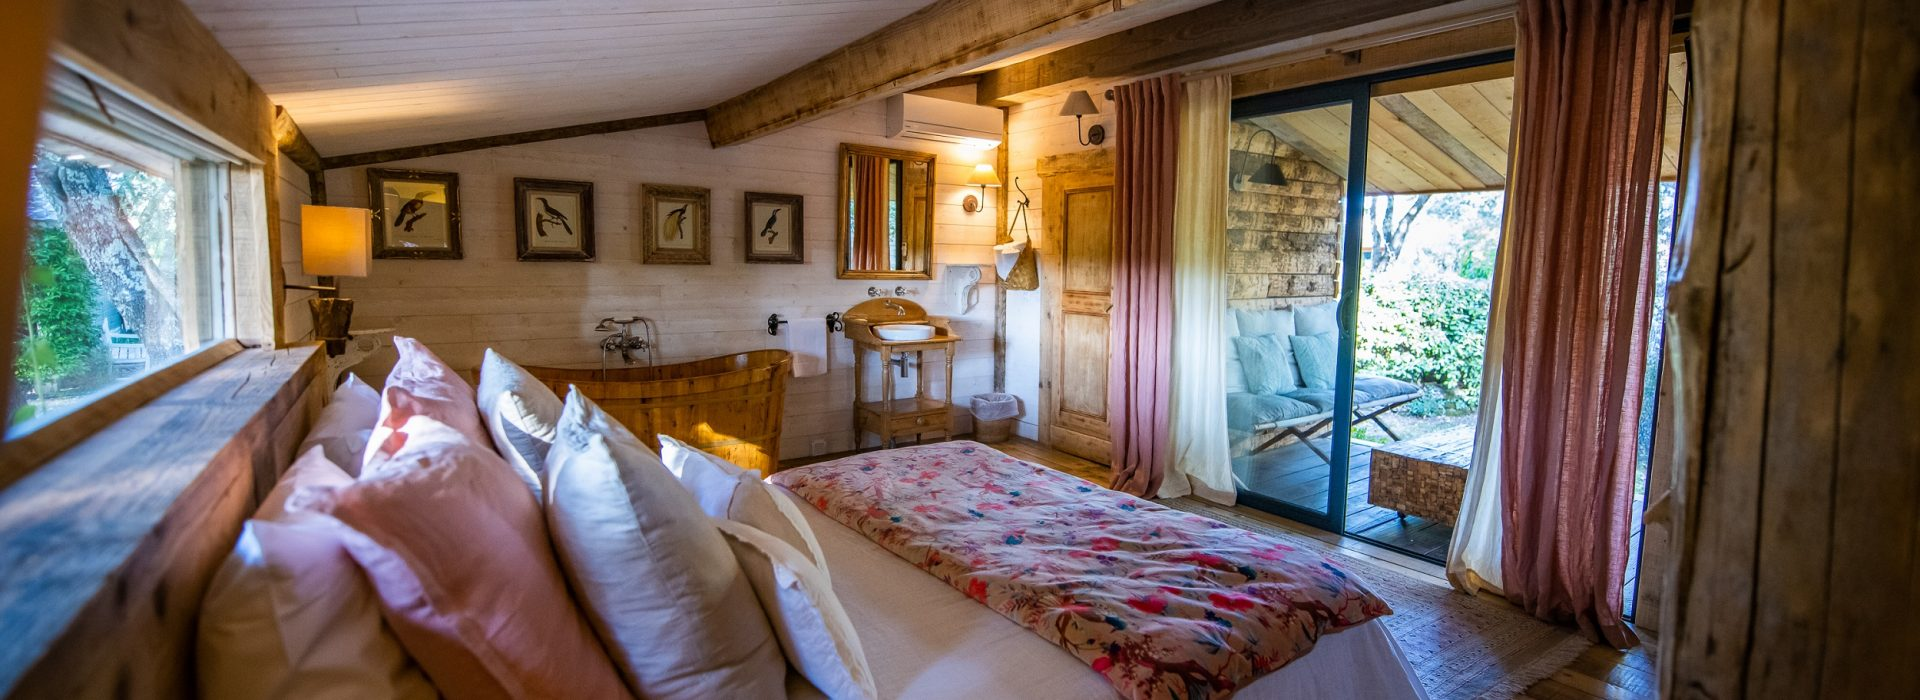 jacaranda_chambre_terrasse_villa_vanille_chambre_dhote_de_charme_boisseron_herault